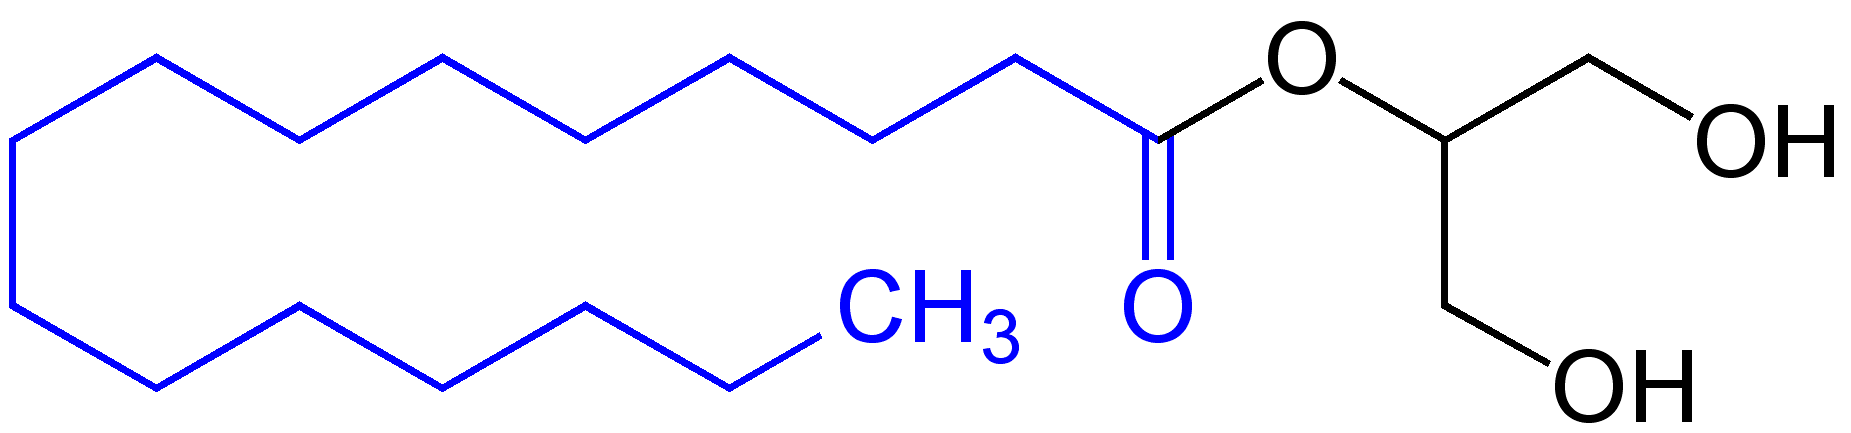 Monoglycerides; Monoacylglycerols